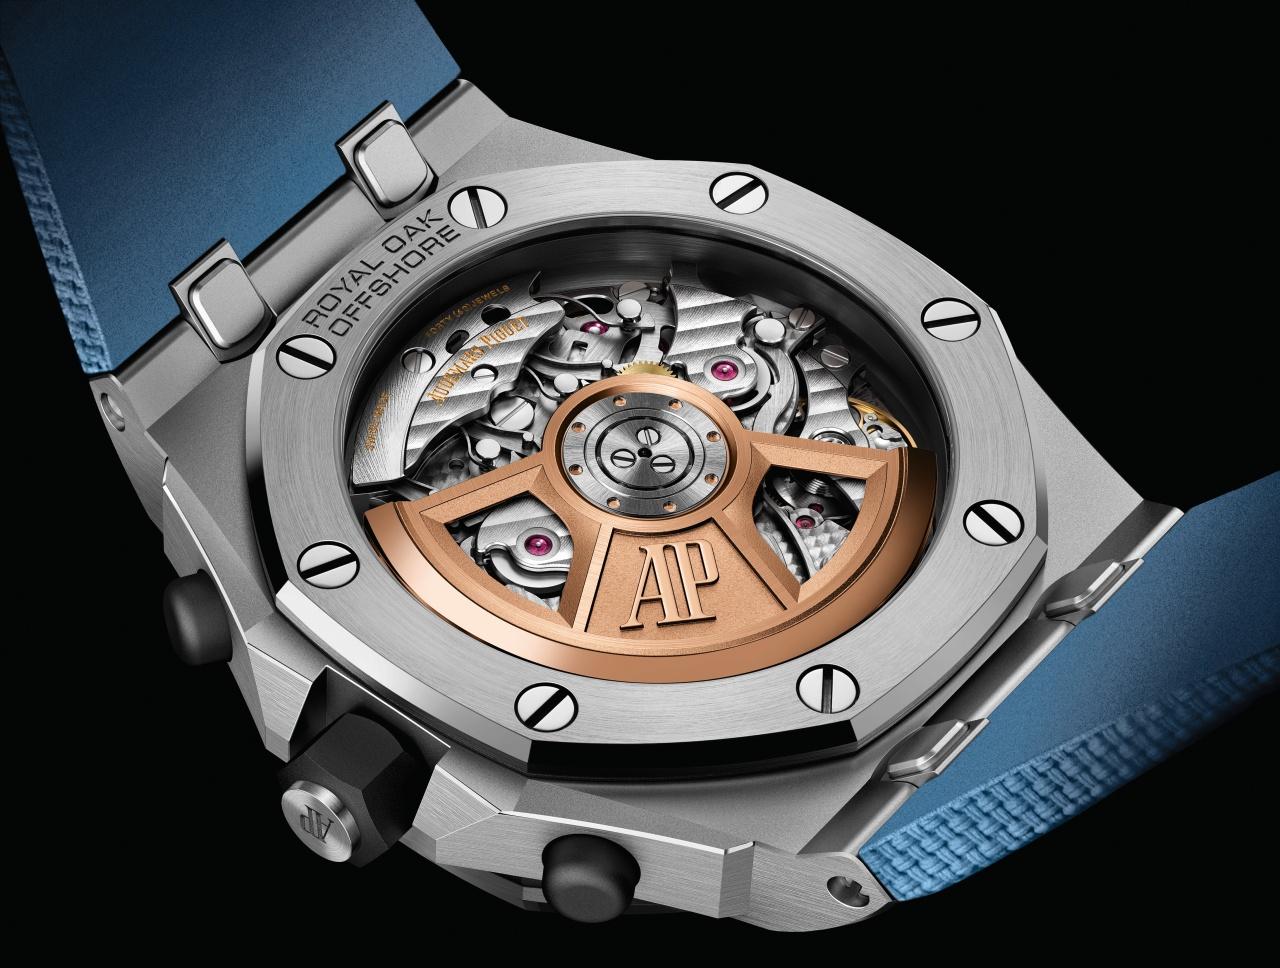 Audemars Piguet Royal Oak Offshore Selfwinding Chronograph models